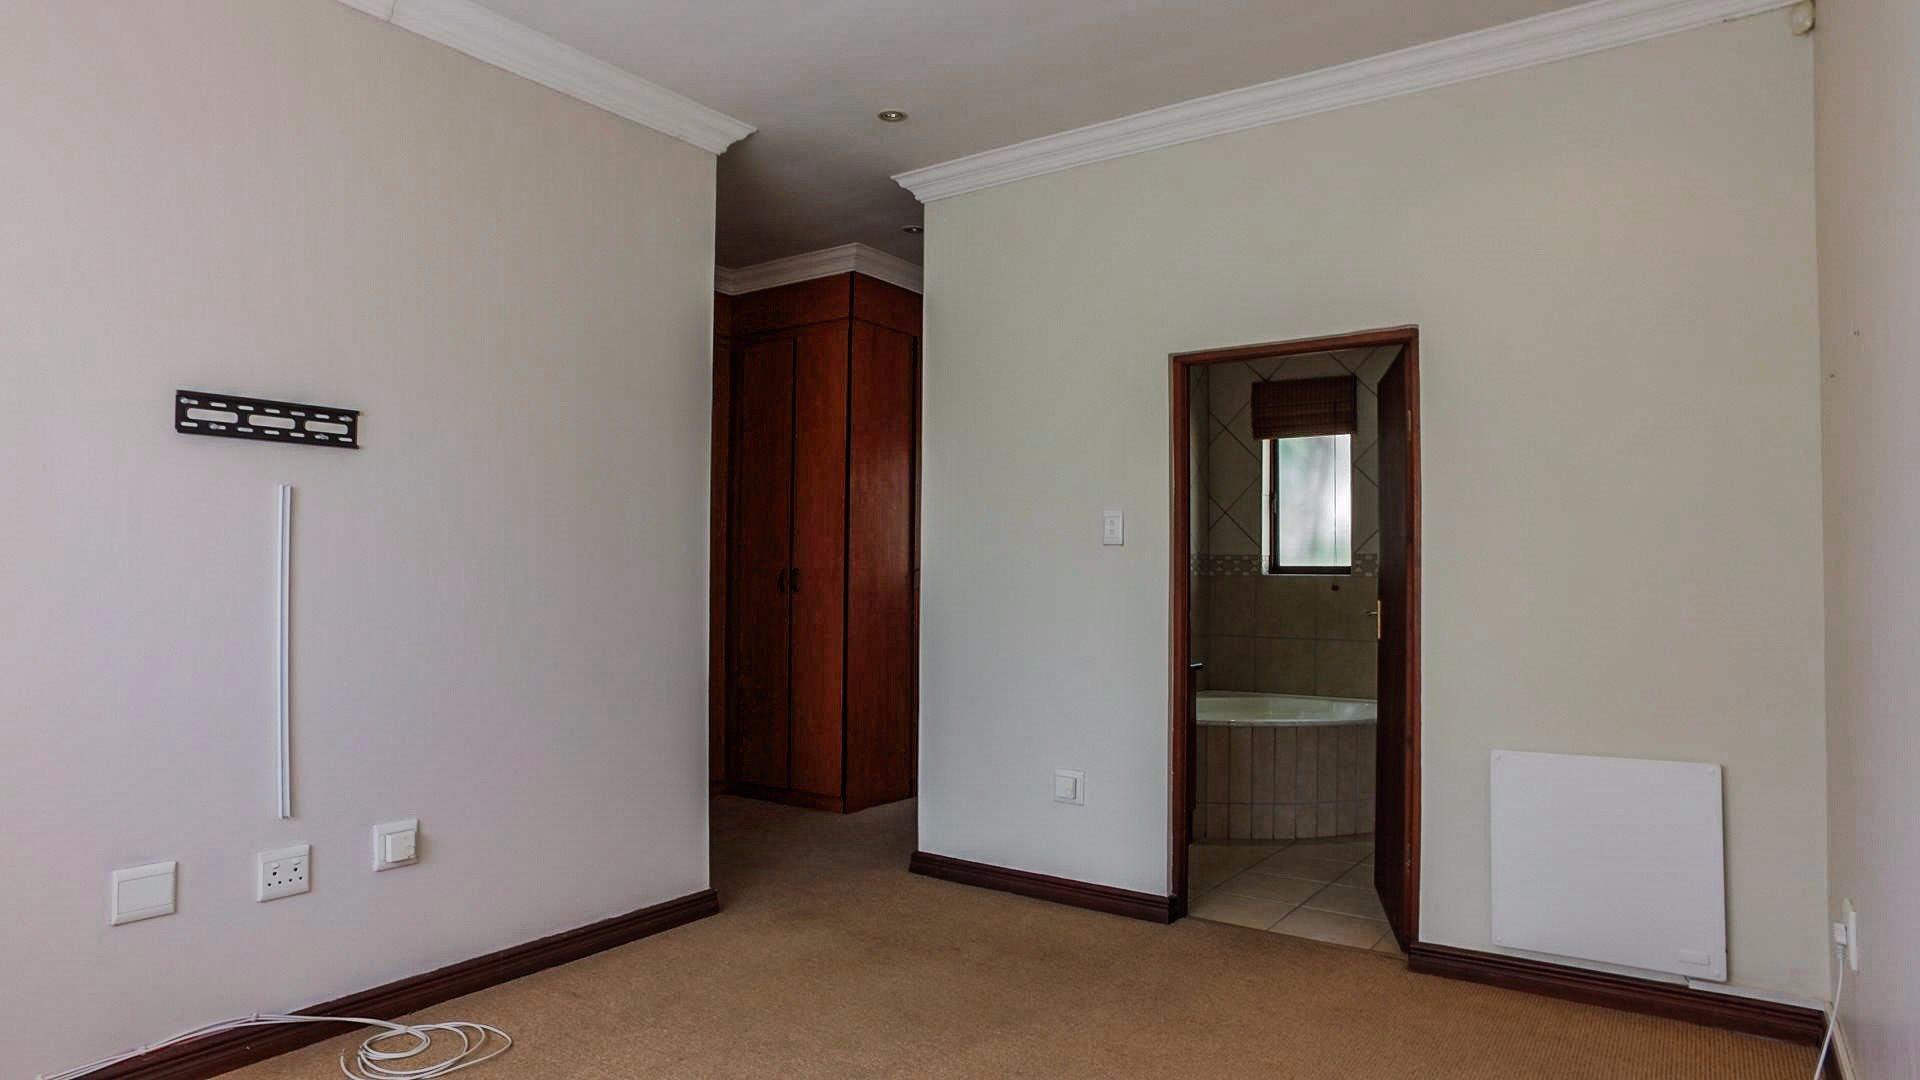 Irene View Estate property for sale. Ref No: 13519995. Picture no 5